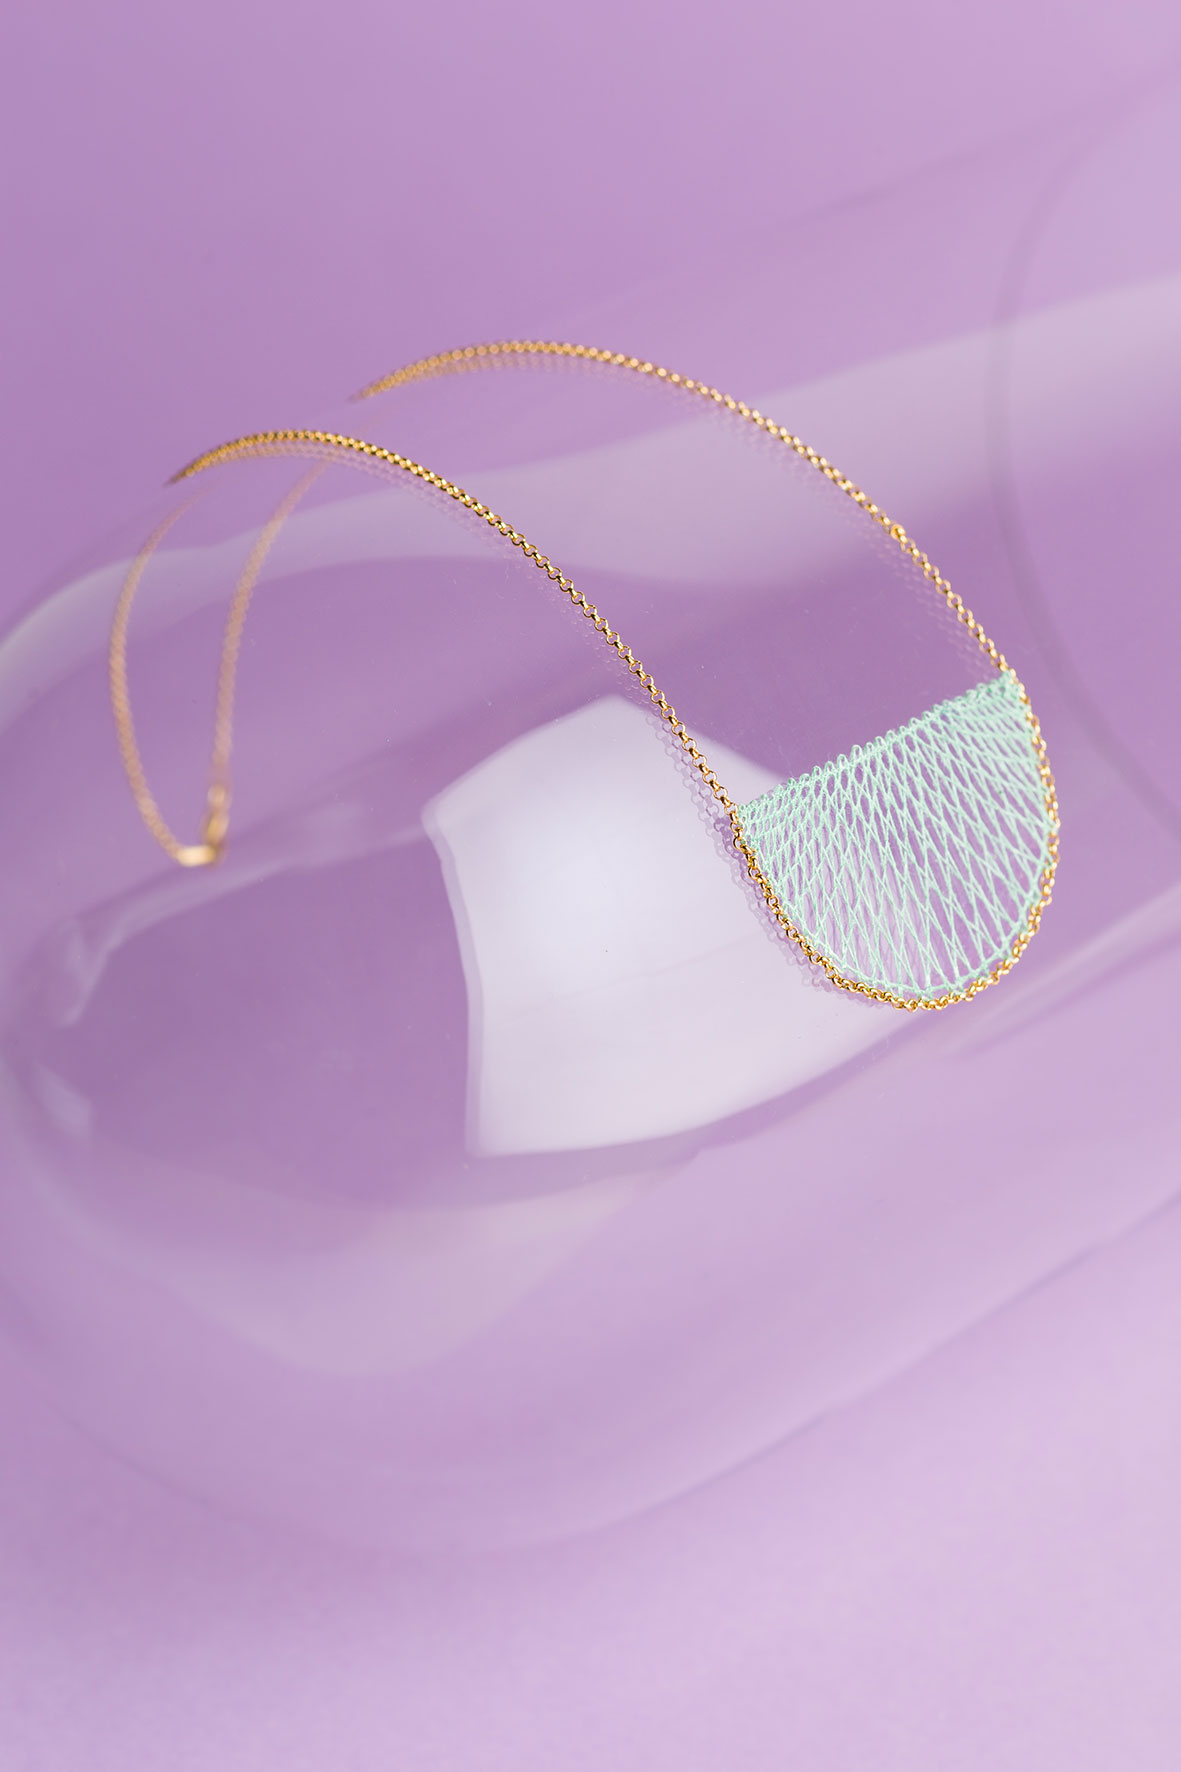 Inlace-Jewelry-8